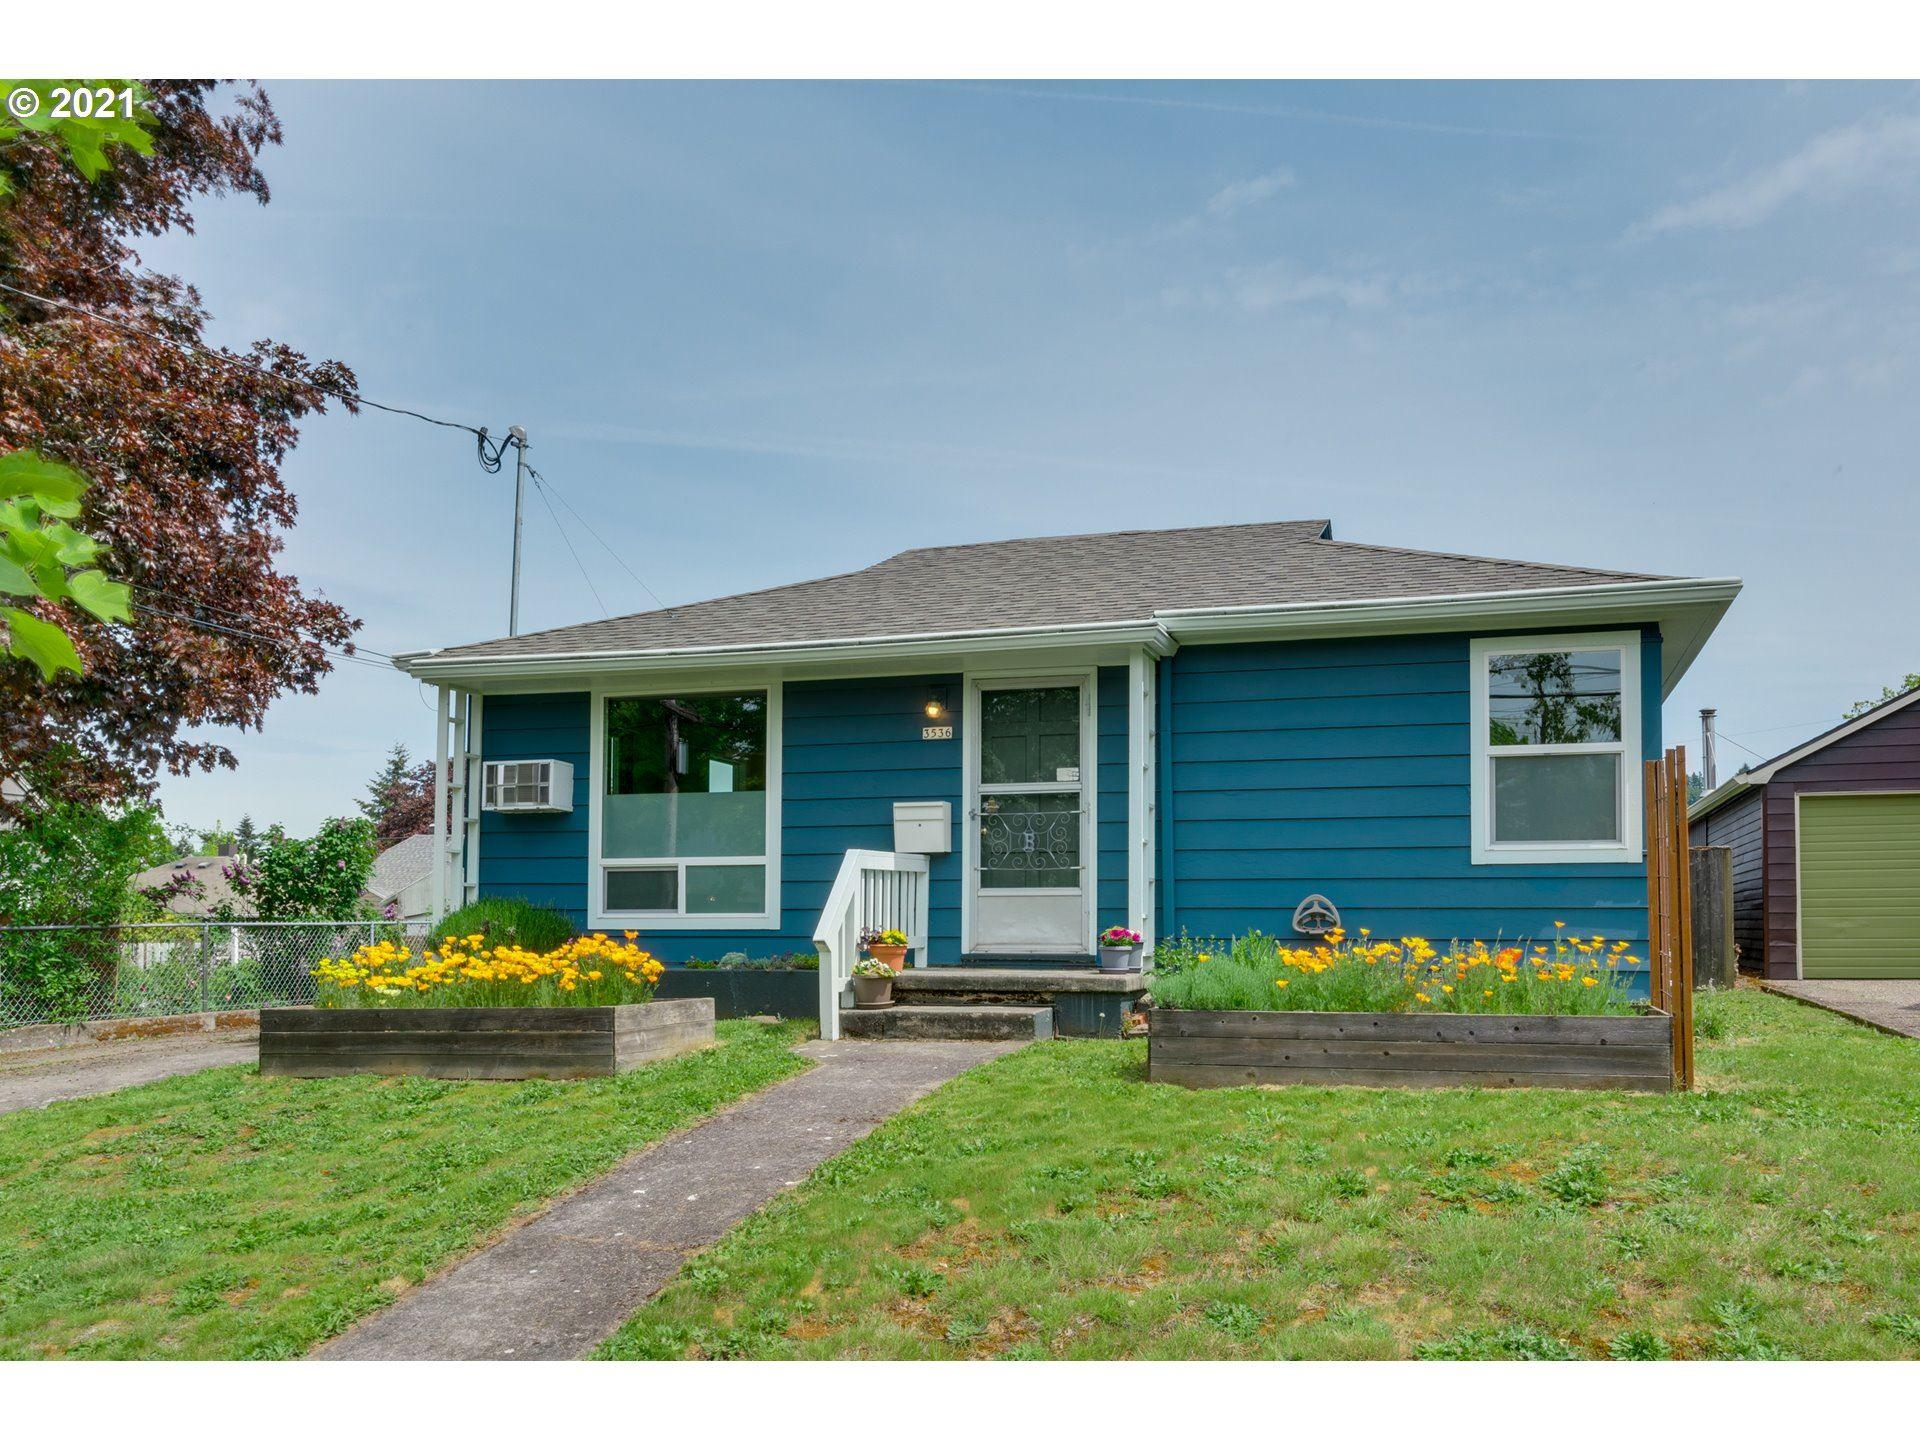 3536 NE 79TH AVE, Portland, OR 97213 - MLS#: 21265114